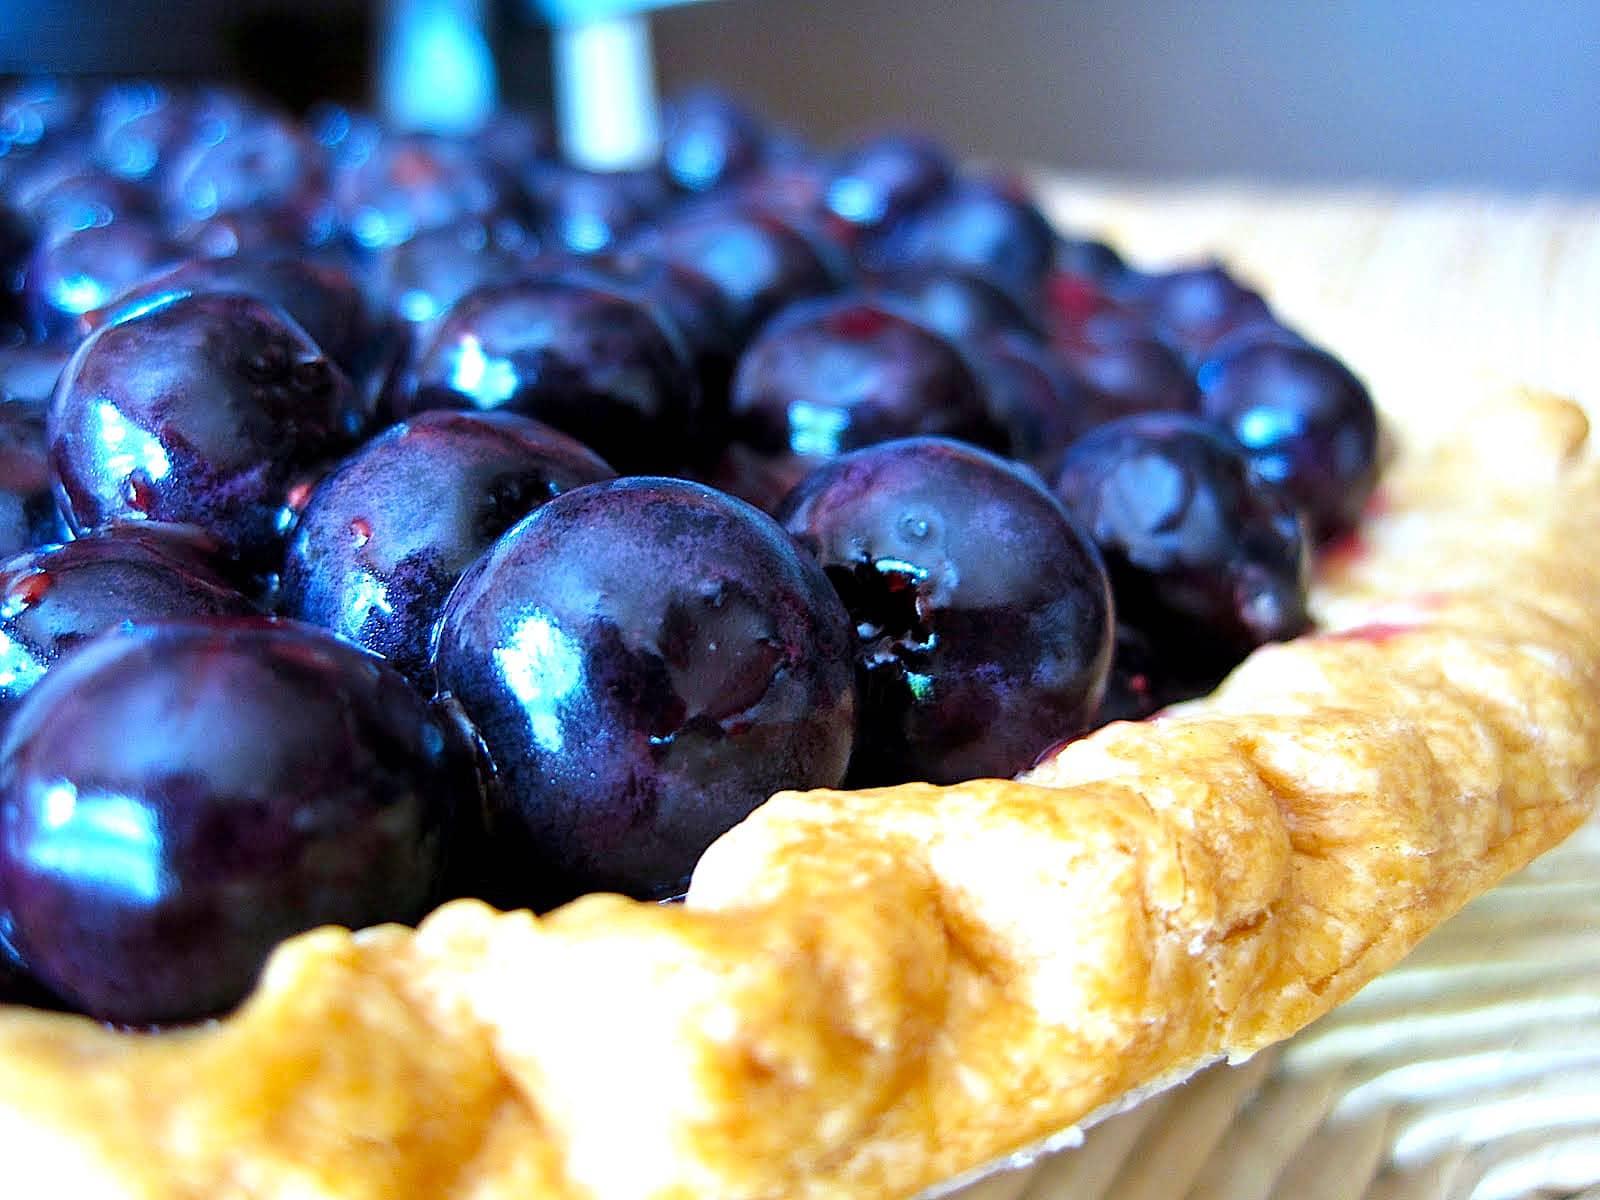 The Hirshon Blueberry Pie